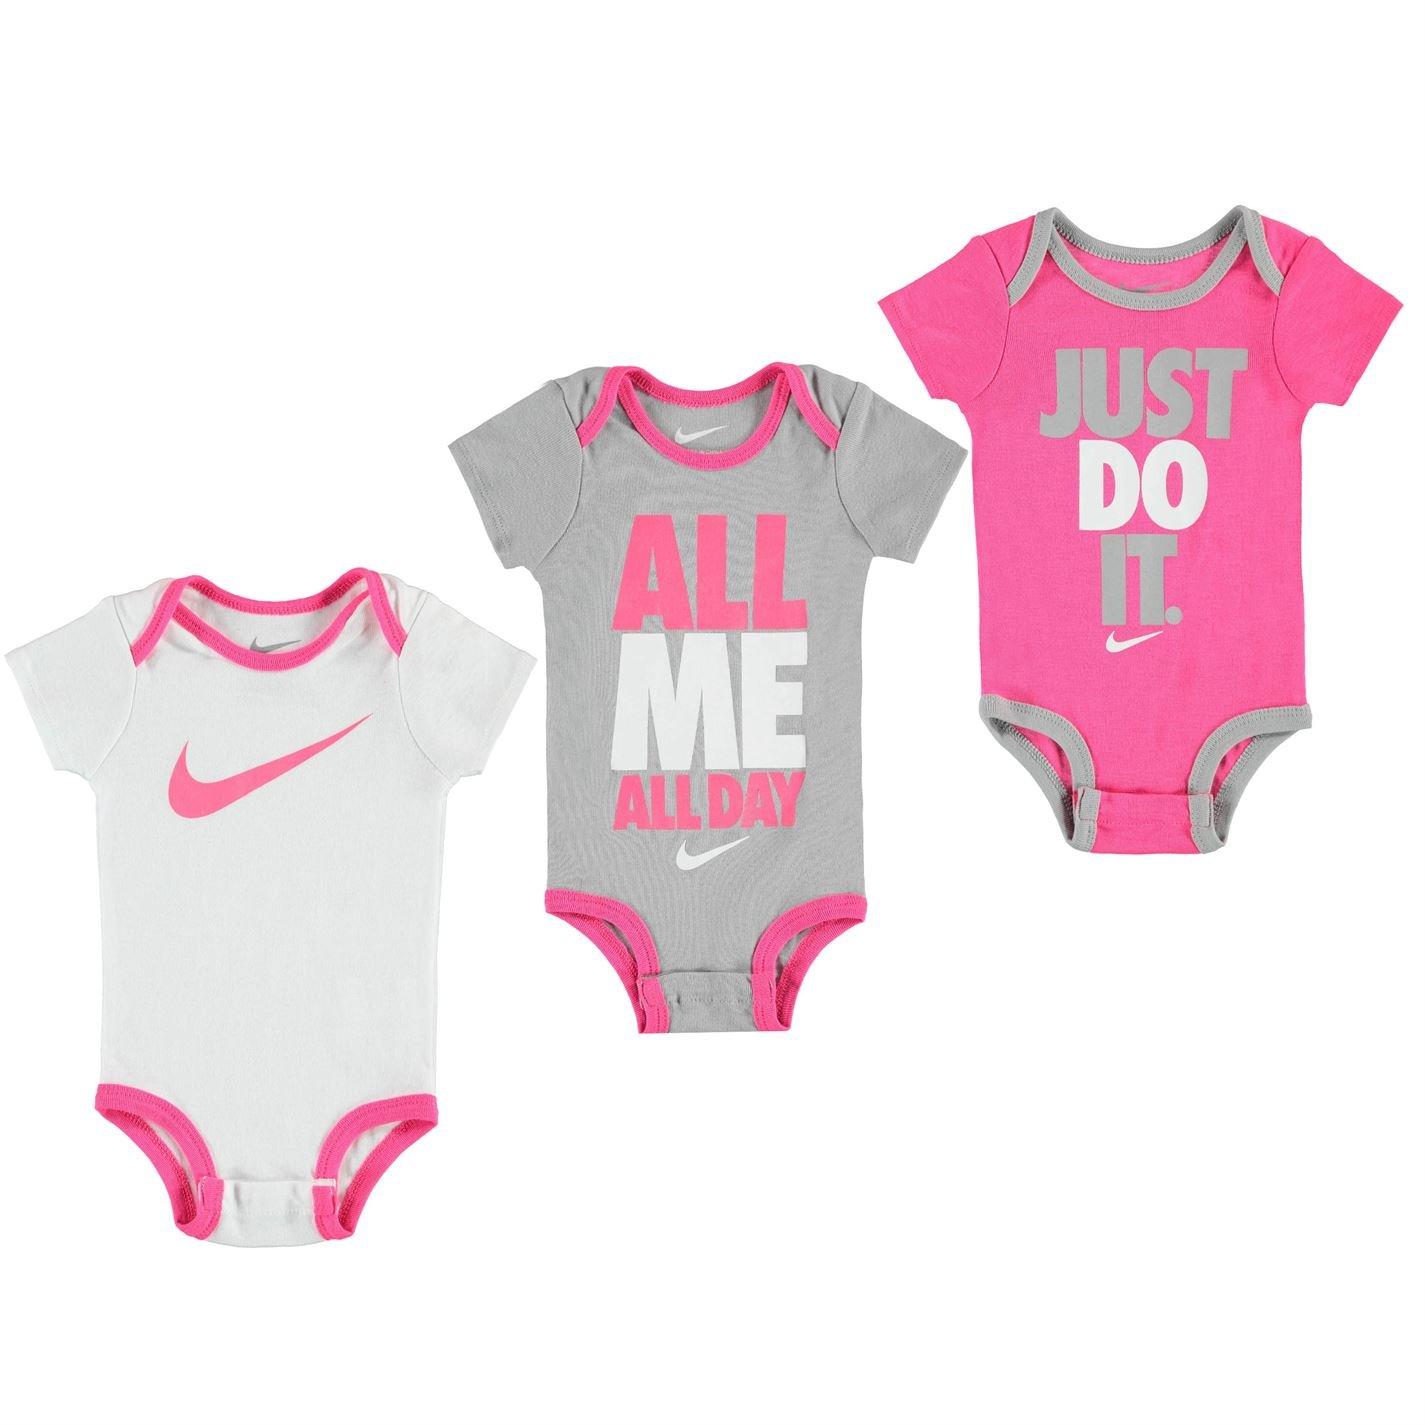 Nike Swoosh 3 Pack Romper Baby Boys Girls Baby Showers Clothing Gift